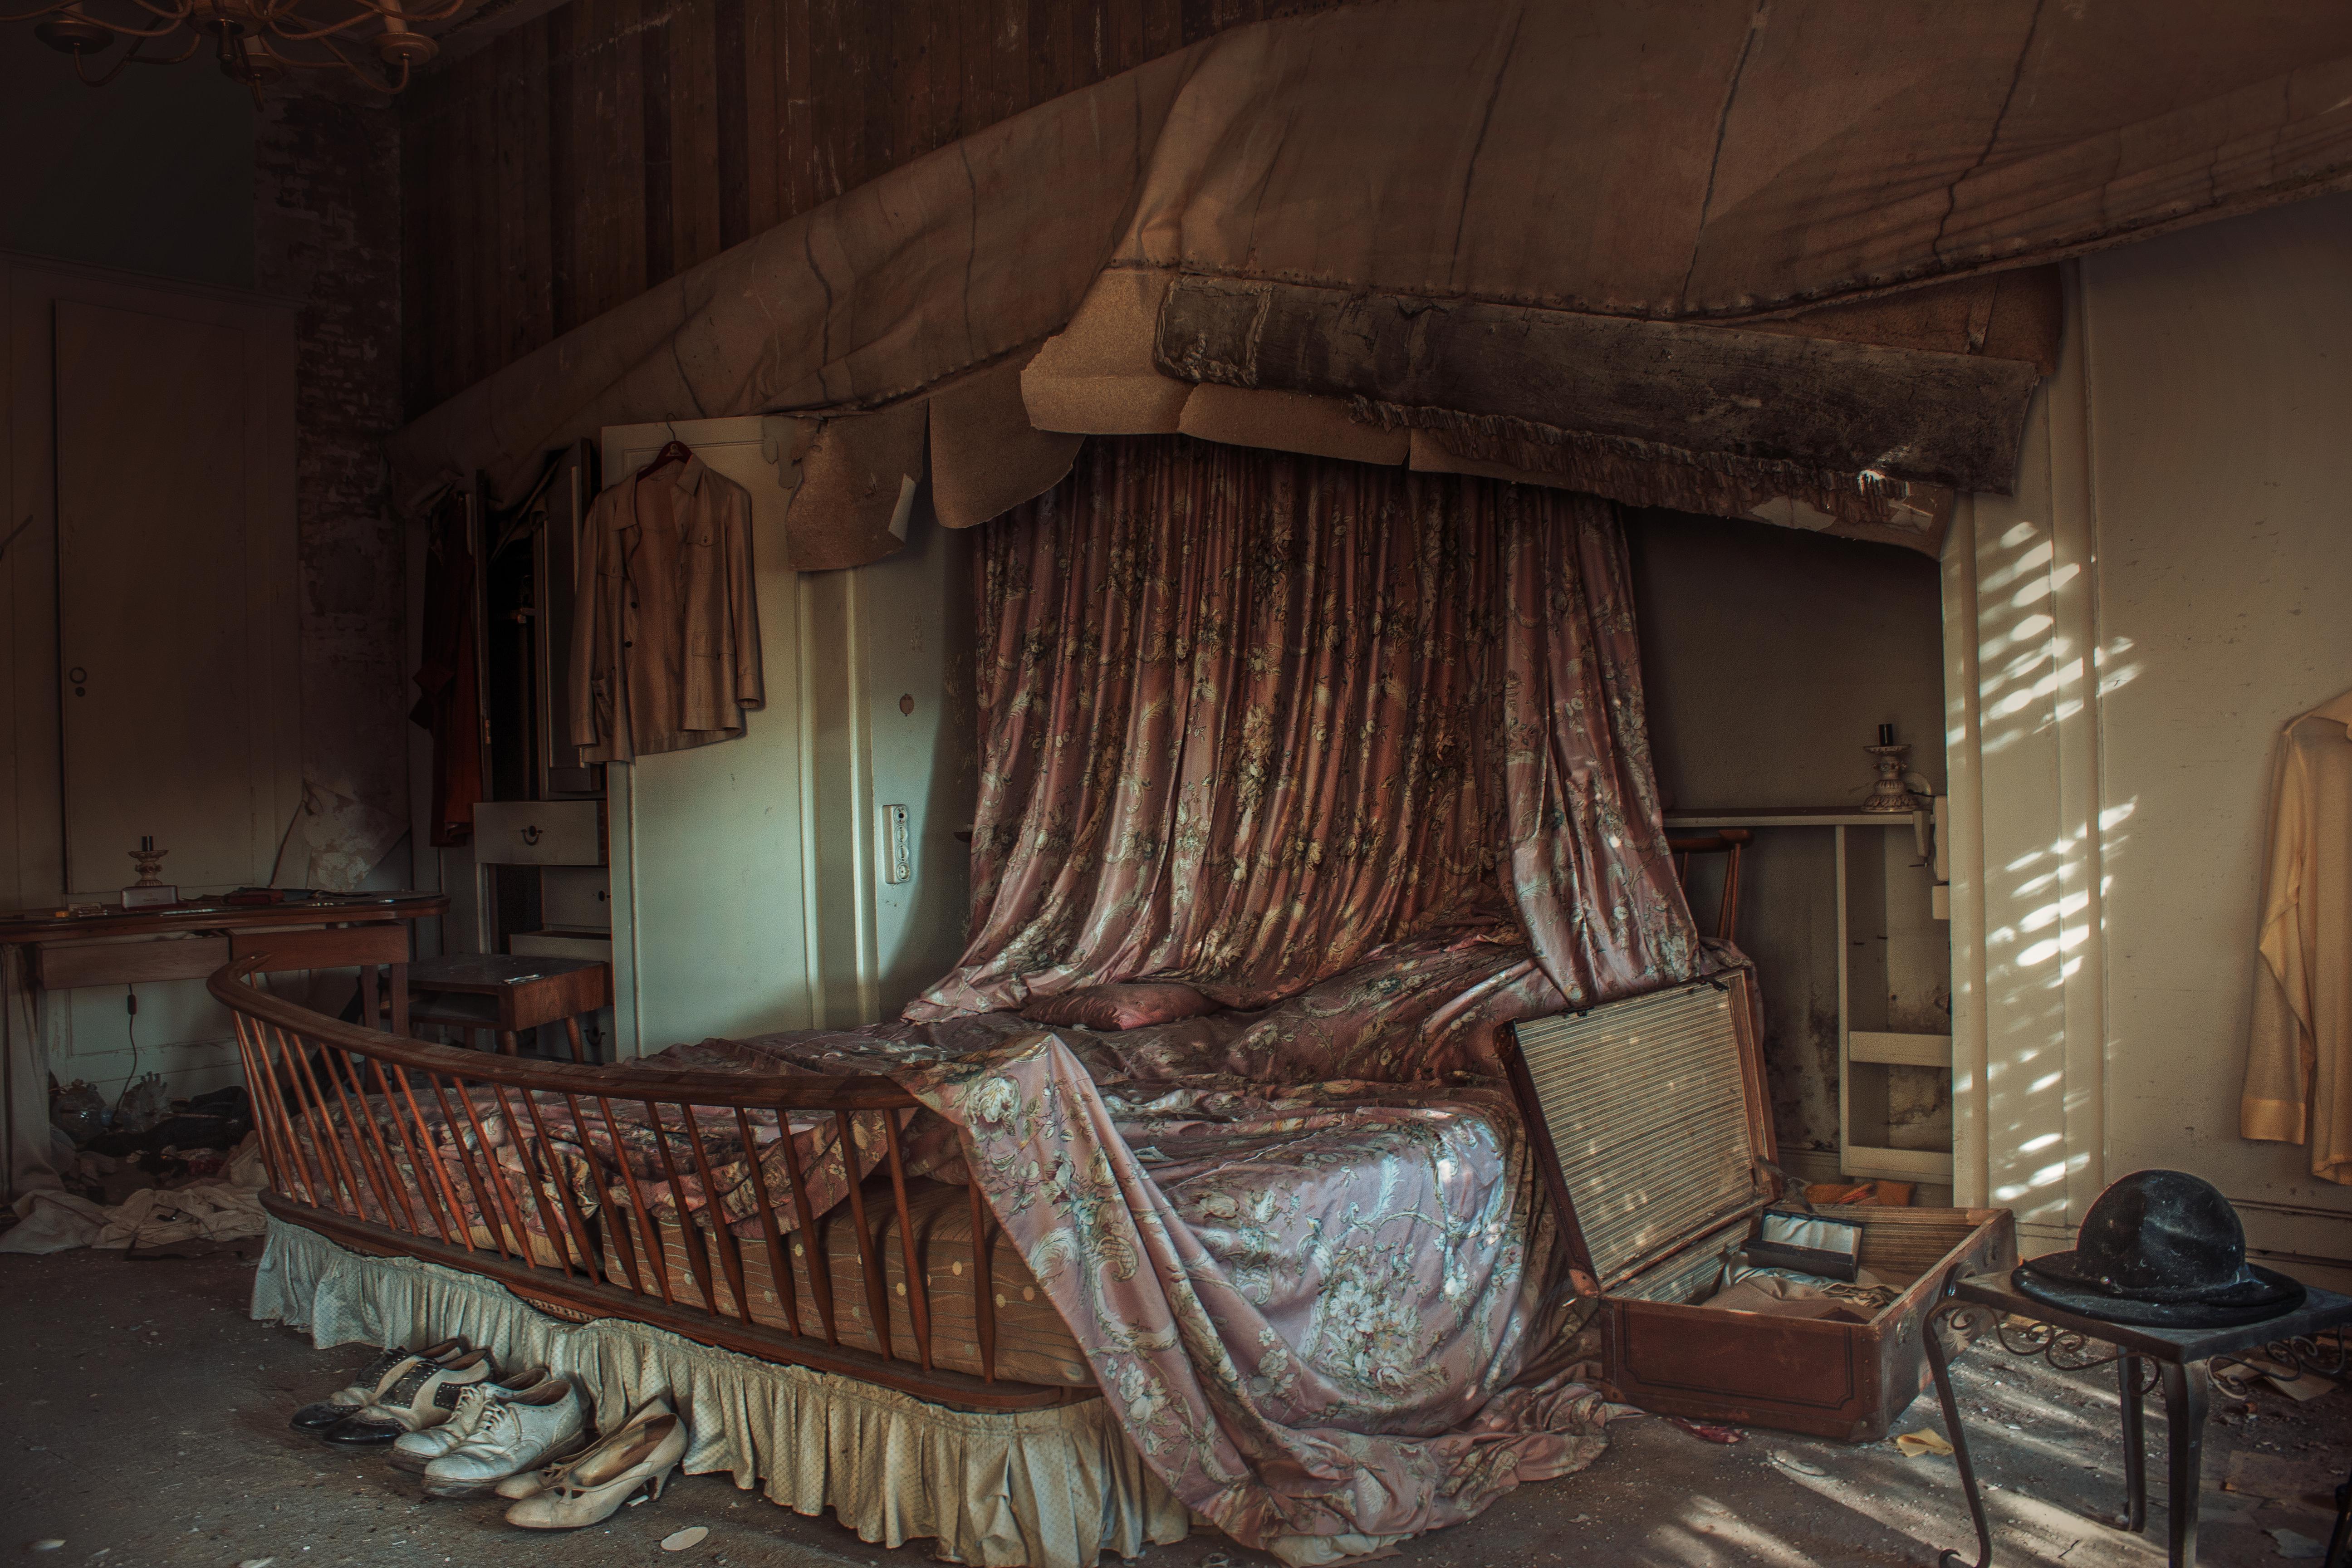 Hintergrundbilder : Fenster, Zimmer, Bett, Holz, Haus, Kanon ...